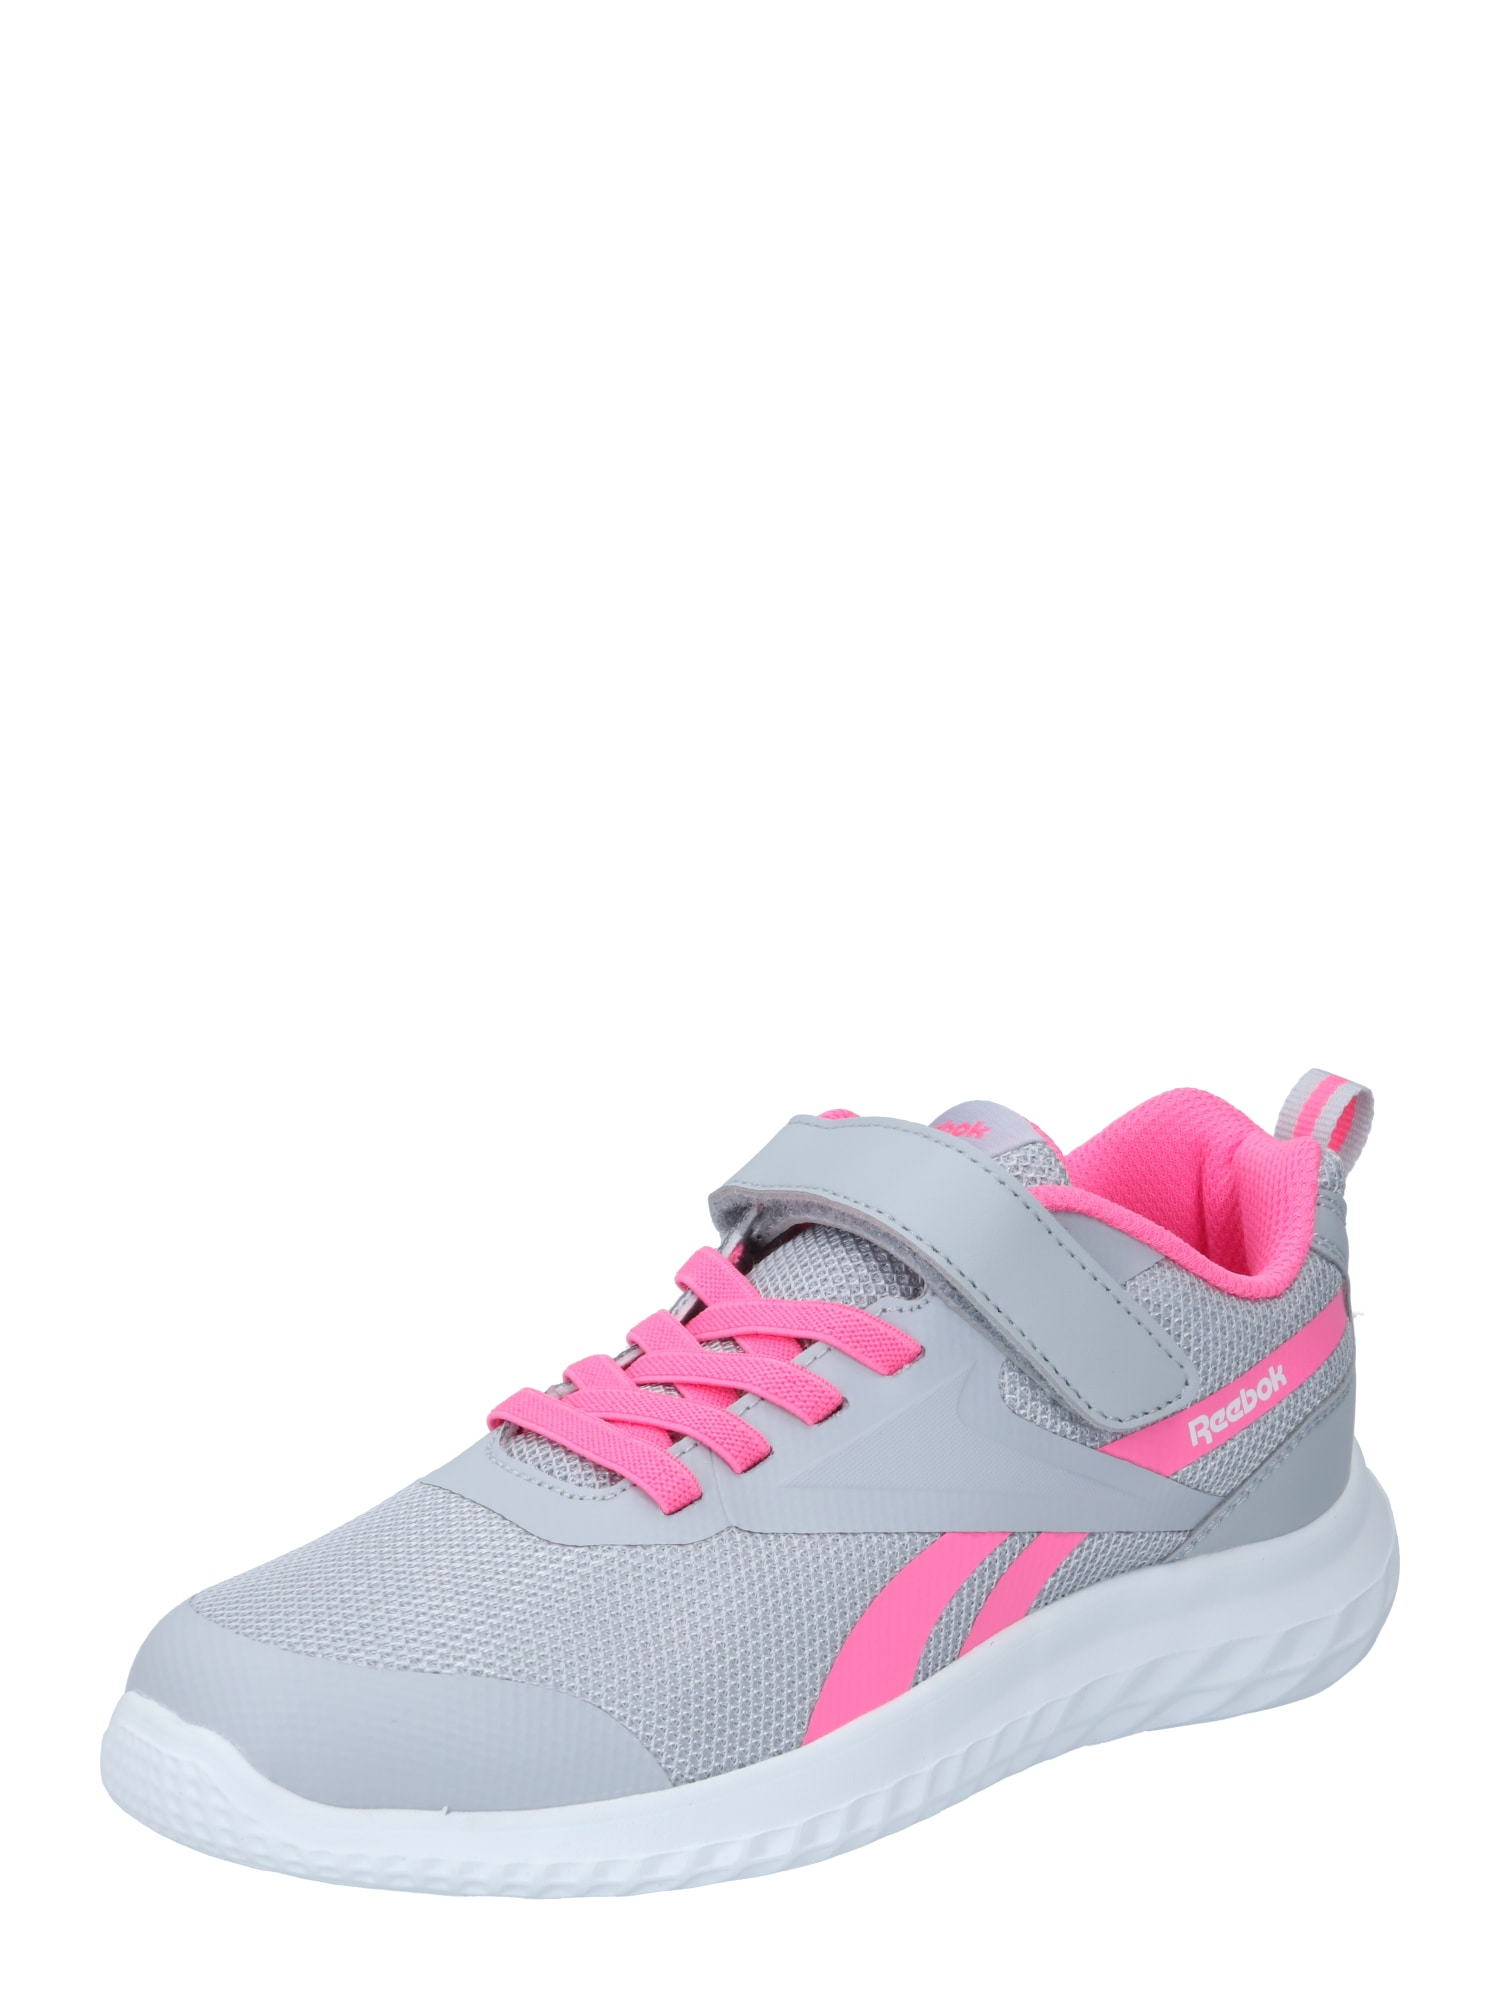 REEBOK Sportiniai batai 'REEBOK RUSH RUNNER 3.0 ALT' pilka